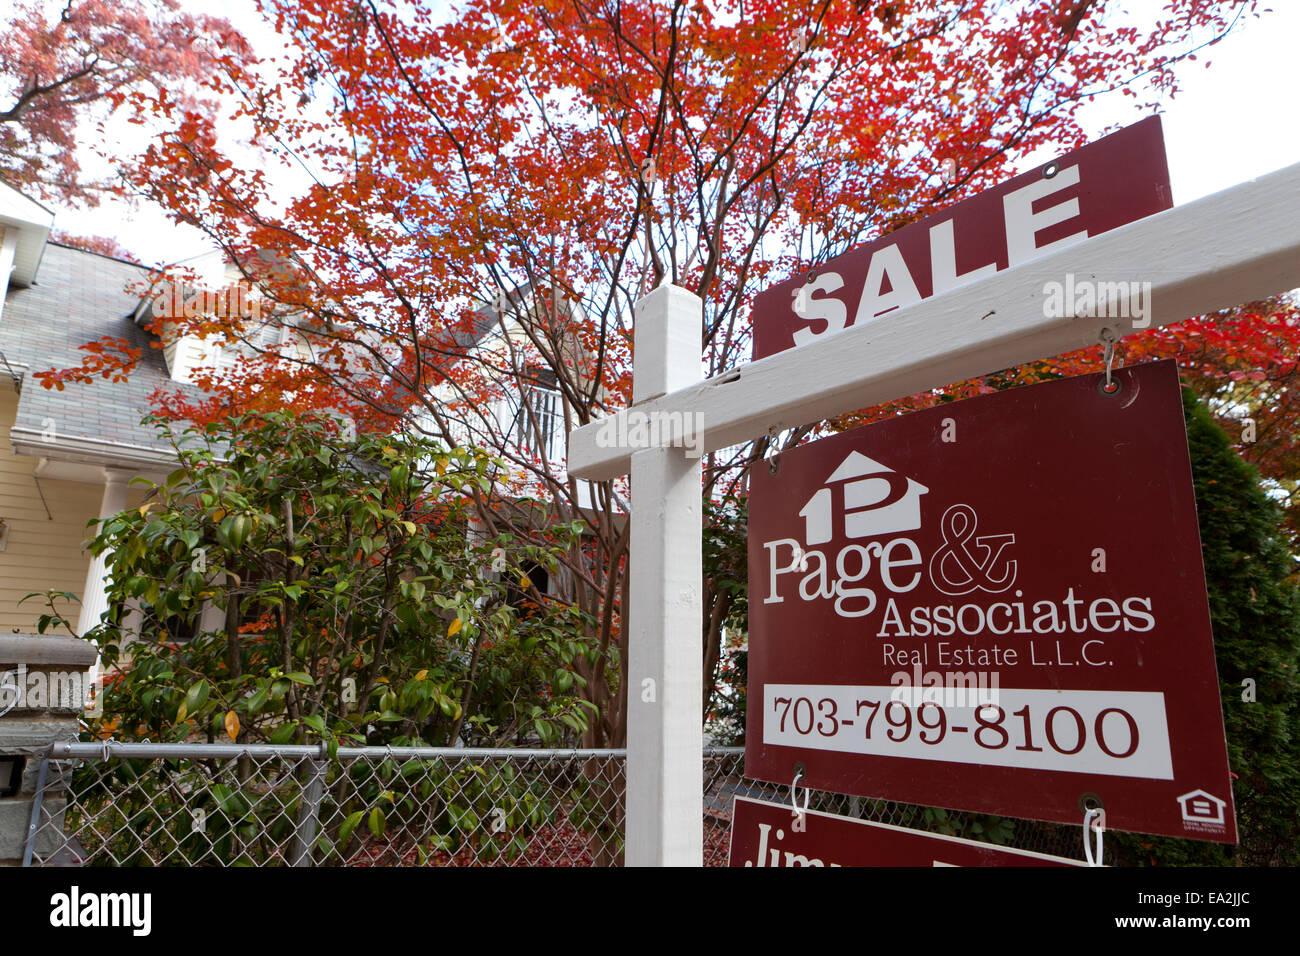 Home for sale sign - USA - Stock Image